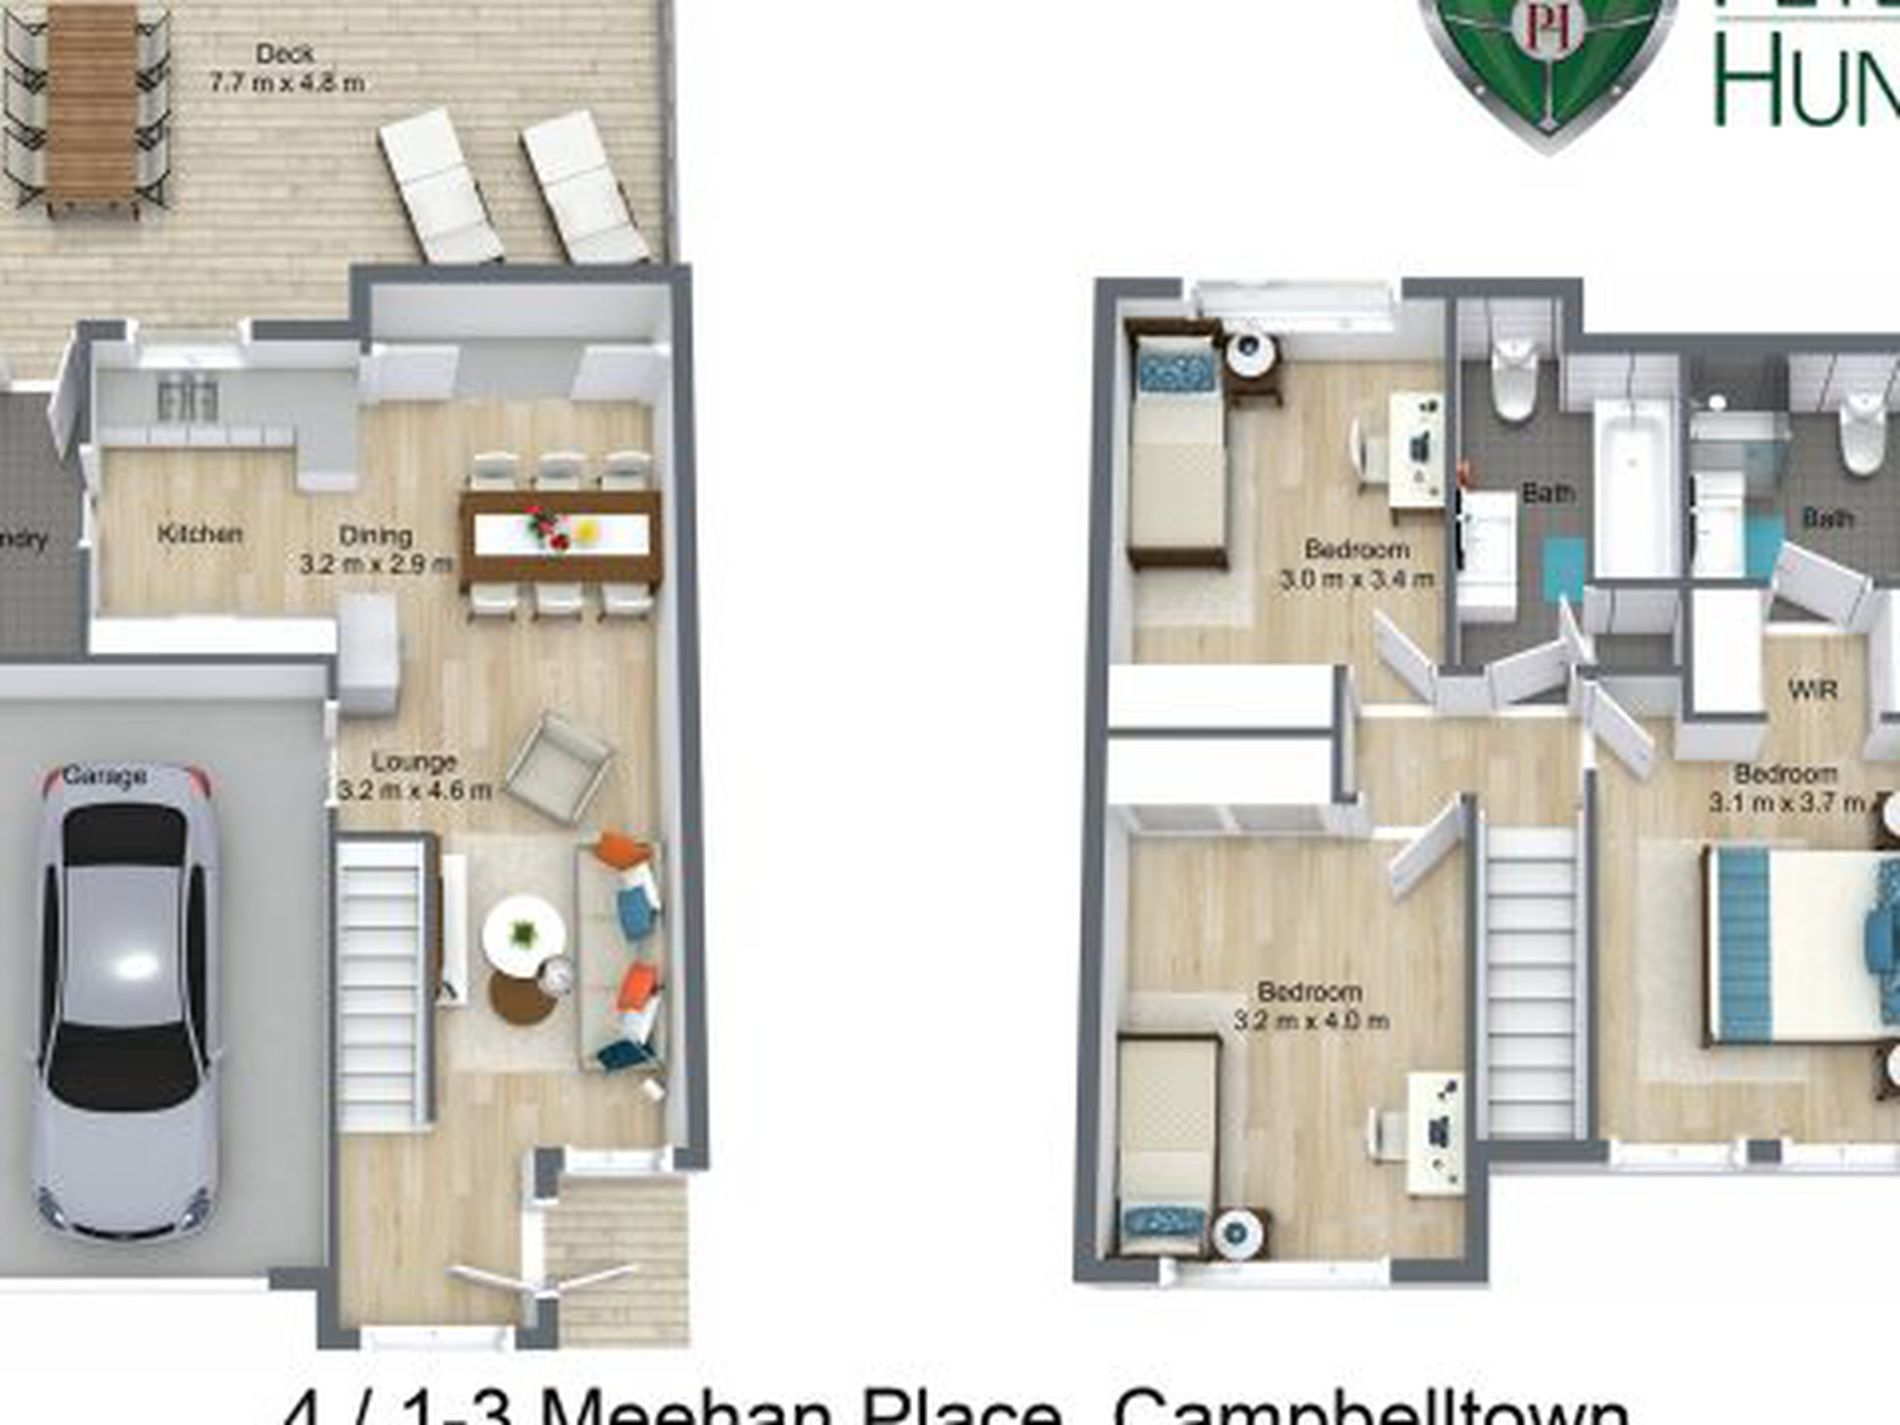 41-3 Meehan Place, Campbelltown